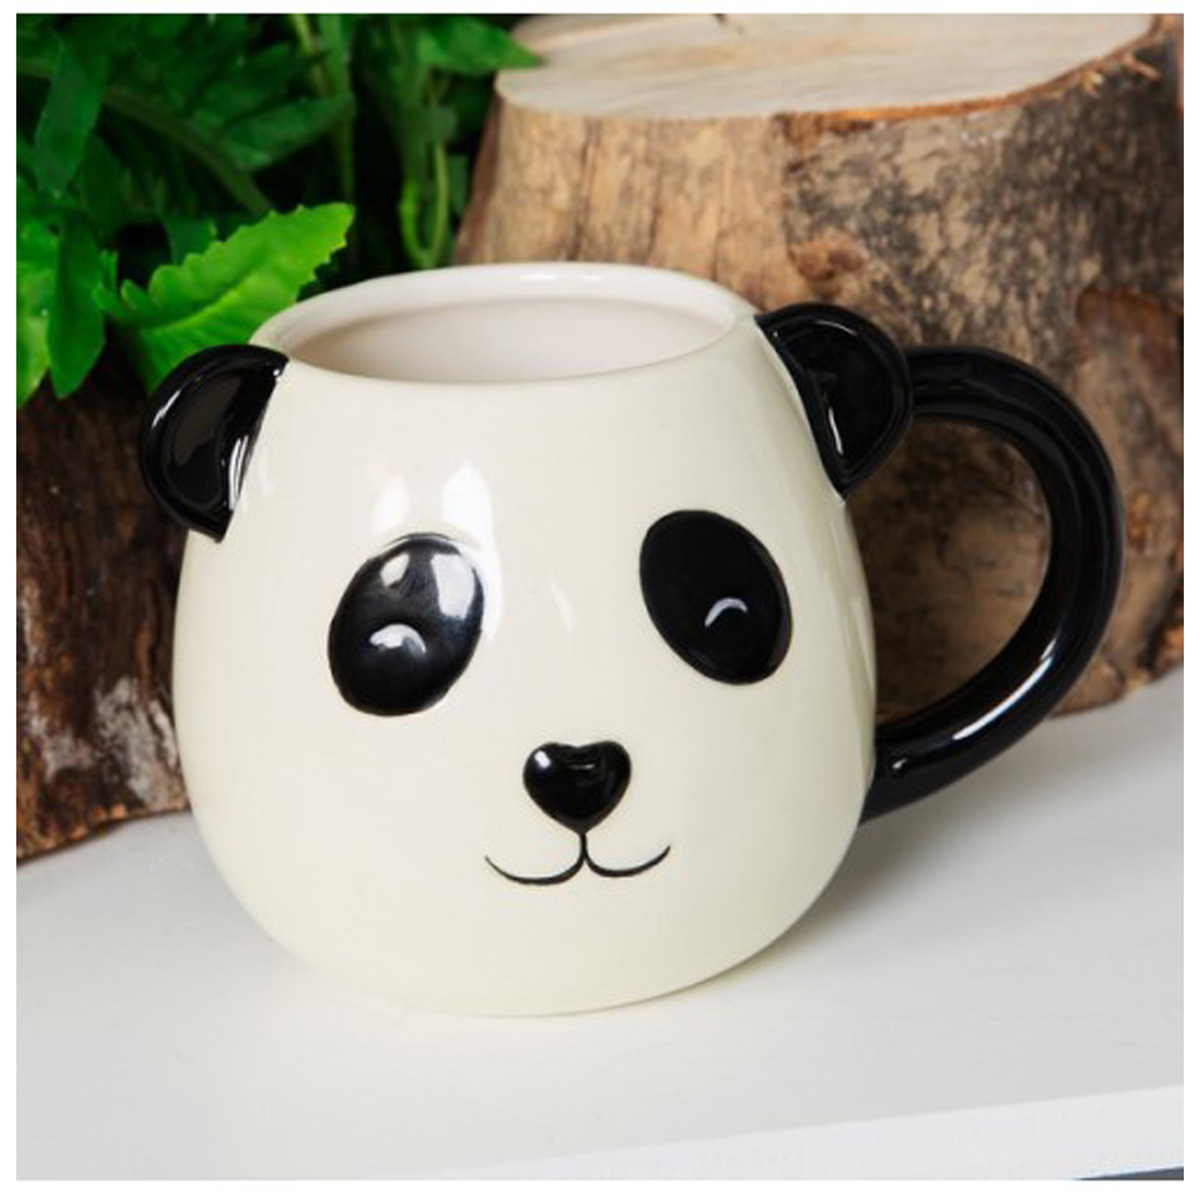 Mug céramique \'Panda\' blanc noir - 9x65 cm - [Q6461]